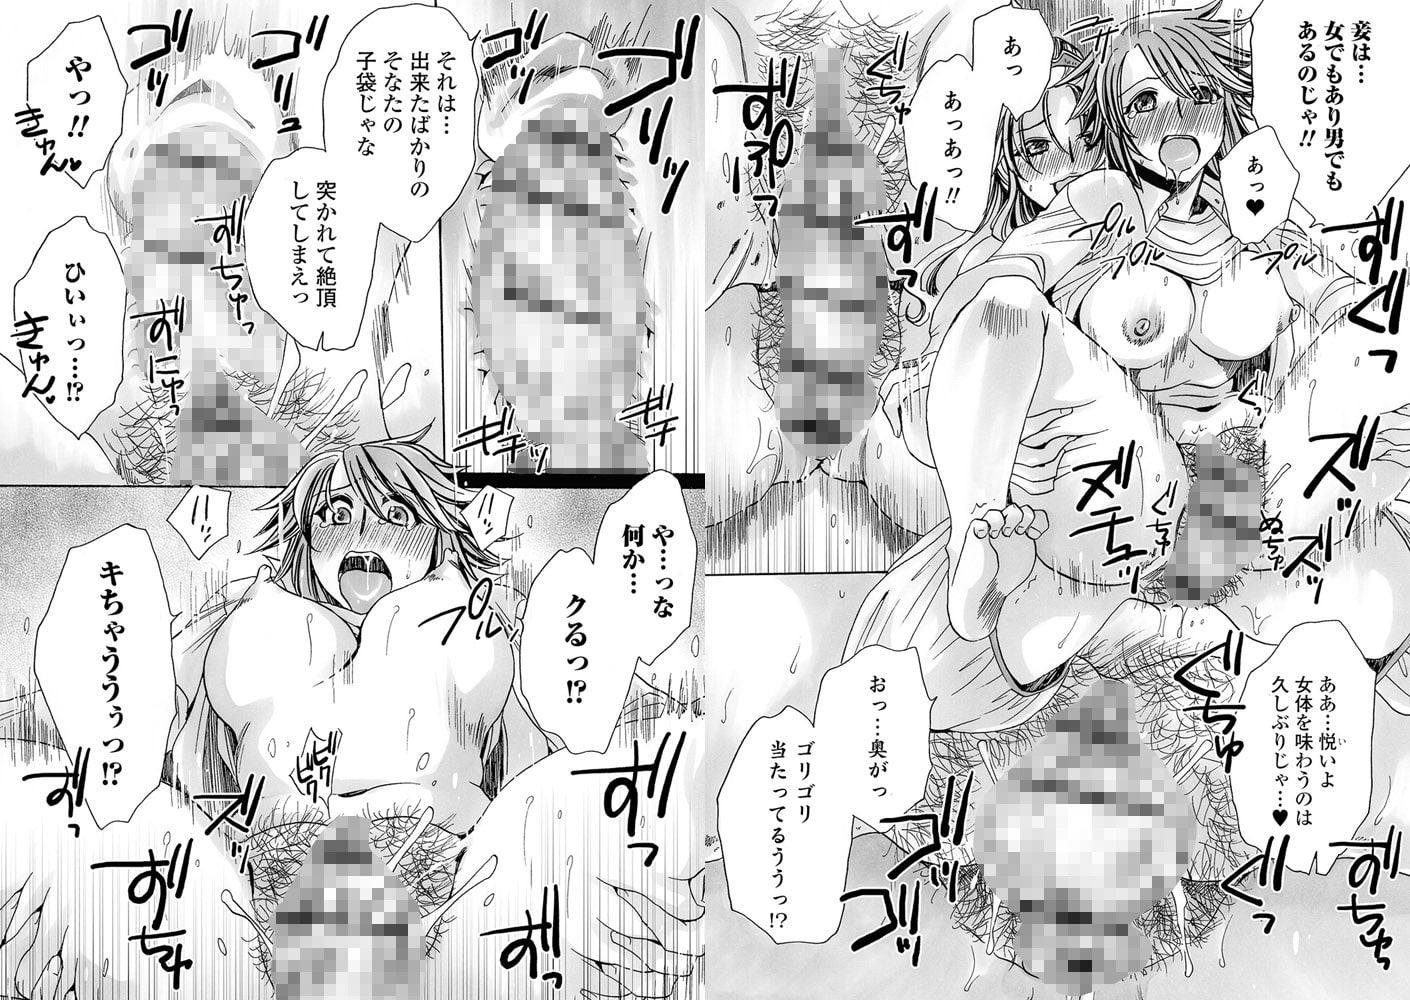 WEB版メスイキ!!にょたいか遊戯 Vol.03